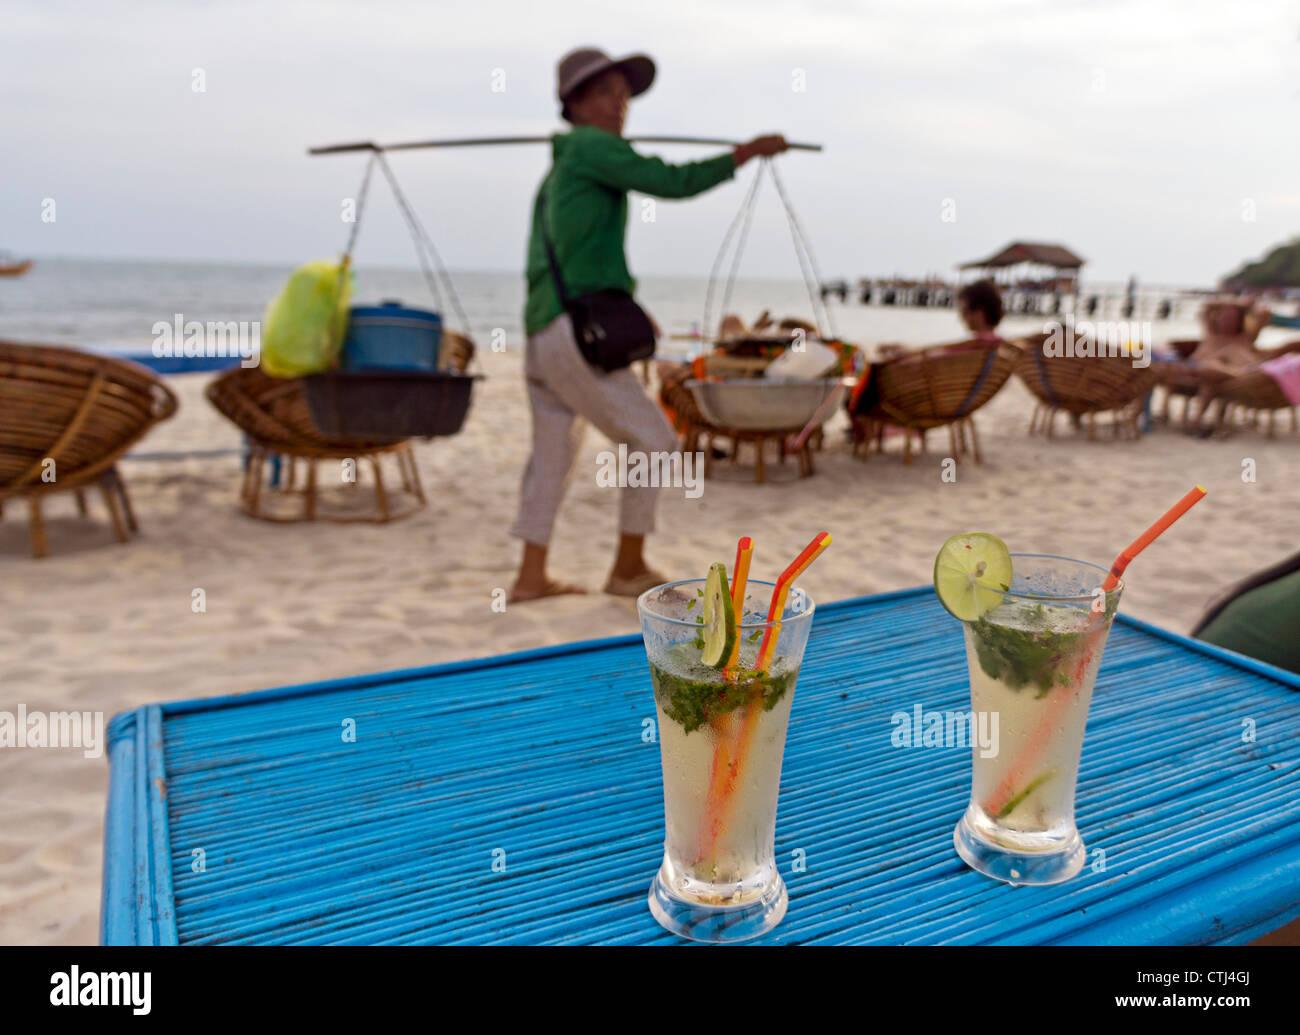 Beach Bar, Occheuteal beach, Sihanoukville, Cambodia, Asia, - Stock Image